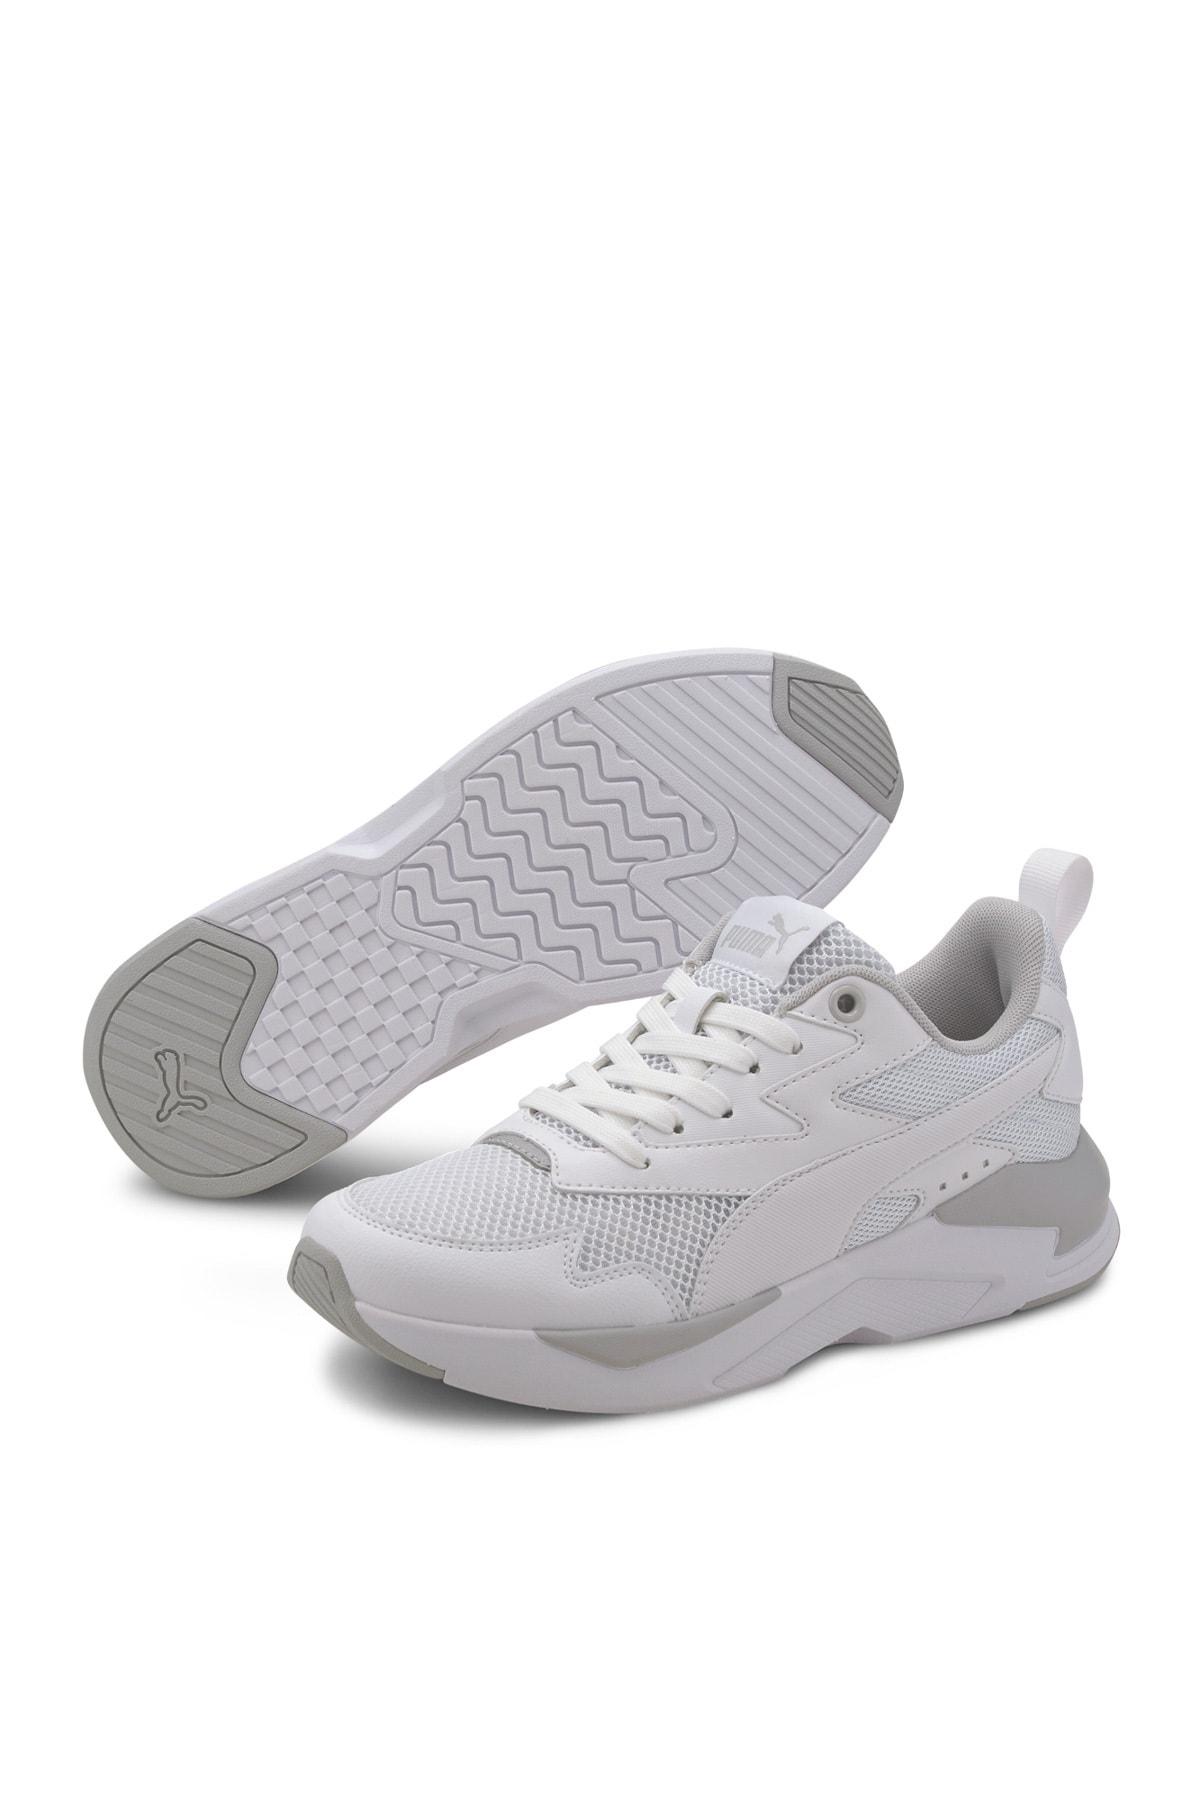 Puma X-RAY LITE JR Beyaz Kız Çocuk Sneaker Ayakkabı 100660673 1